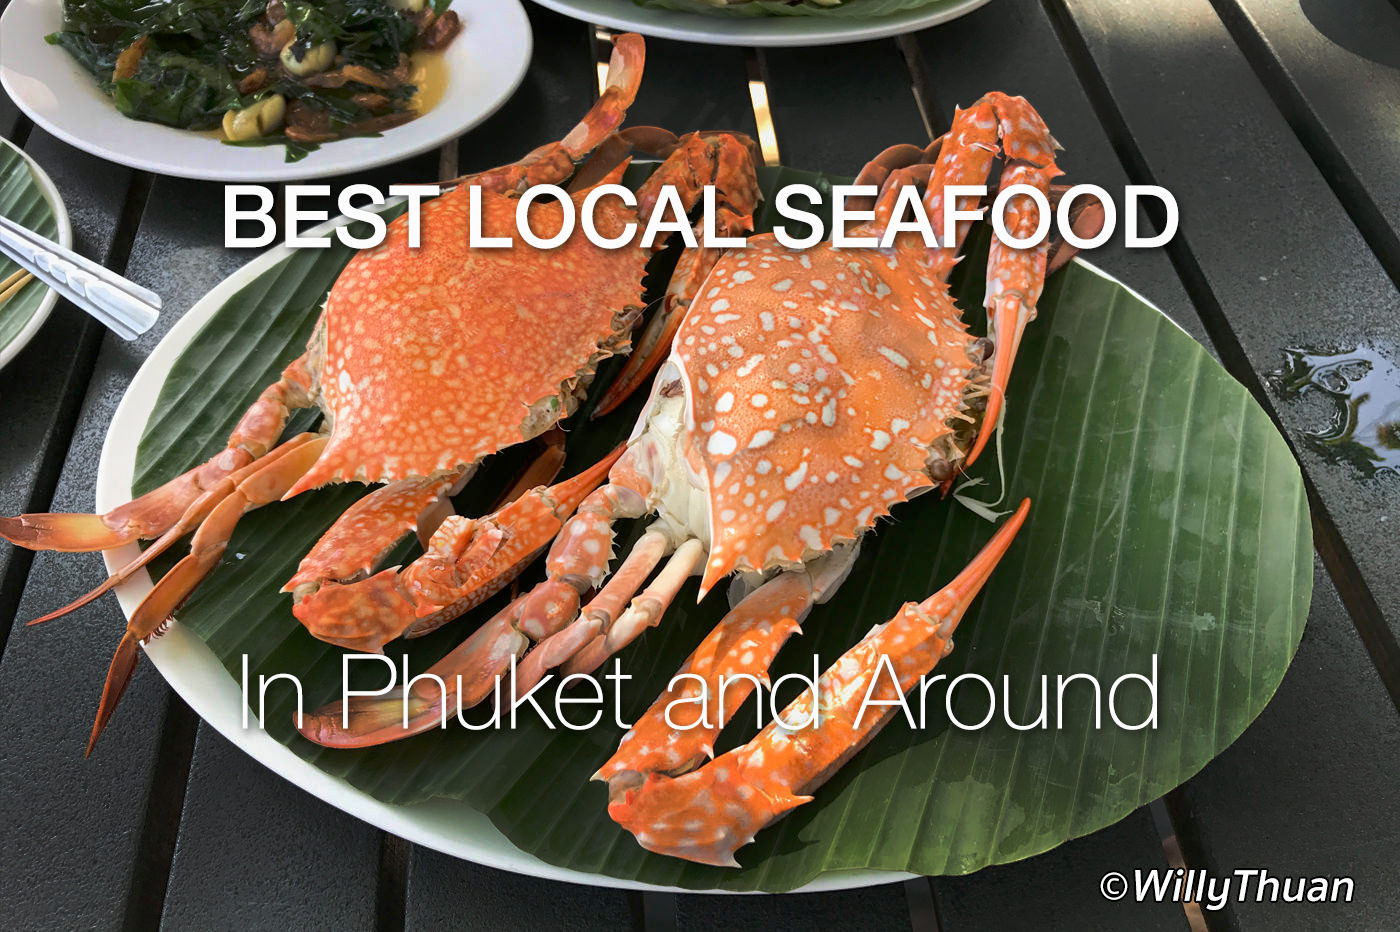 10 Best Local Seafood Restaurants in Phuket